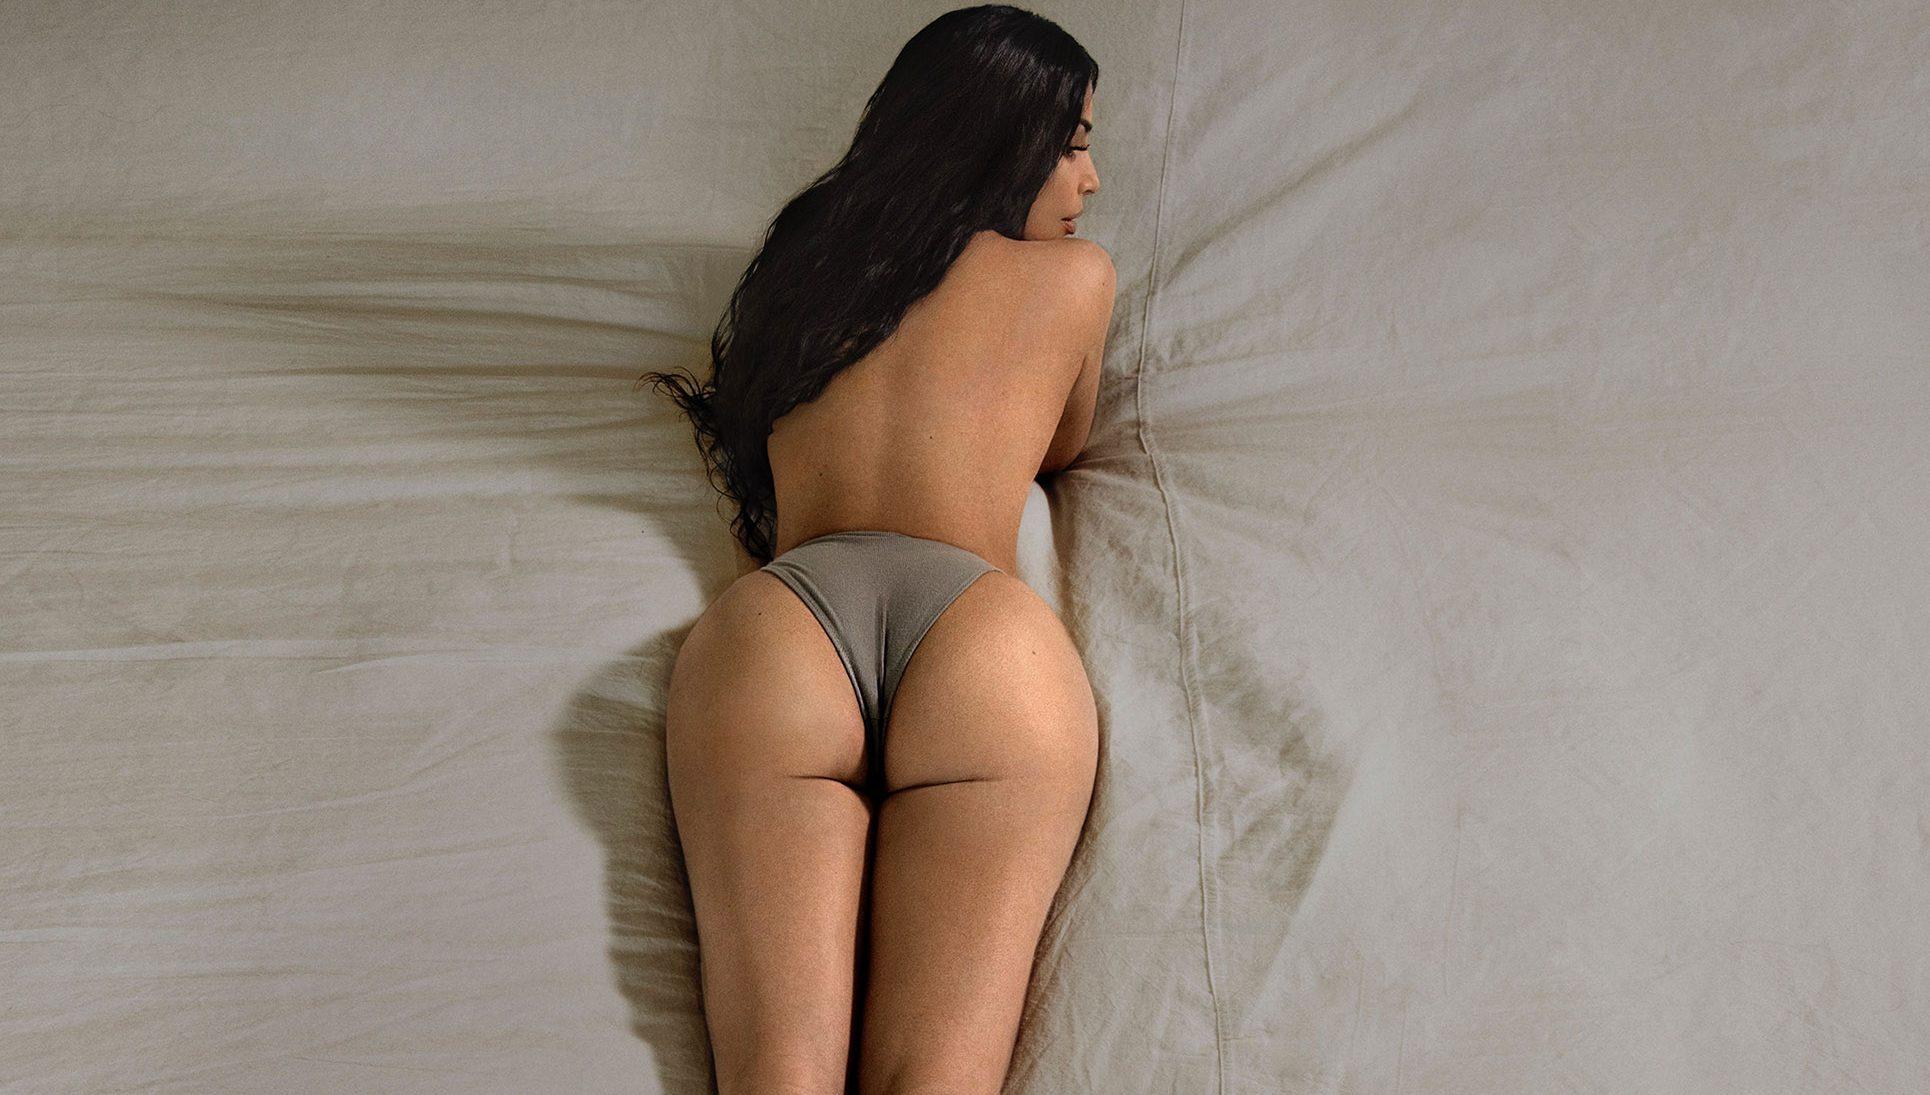 kim-kardashian5_1536748169-4864634